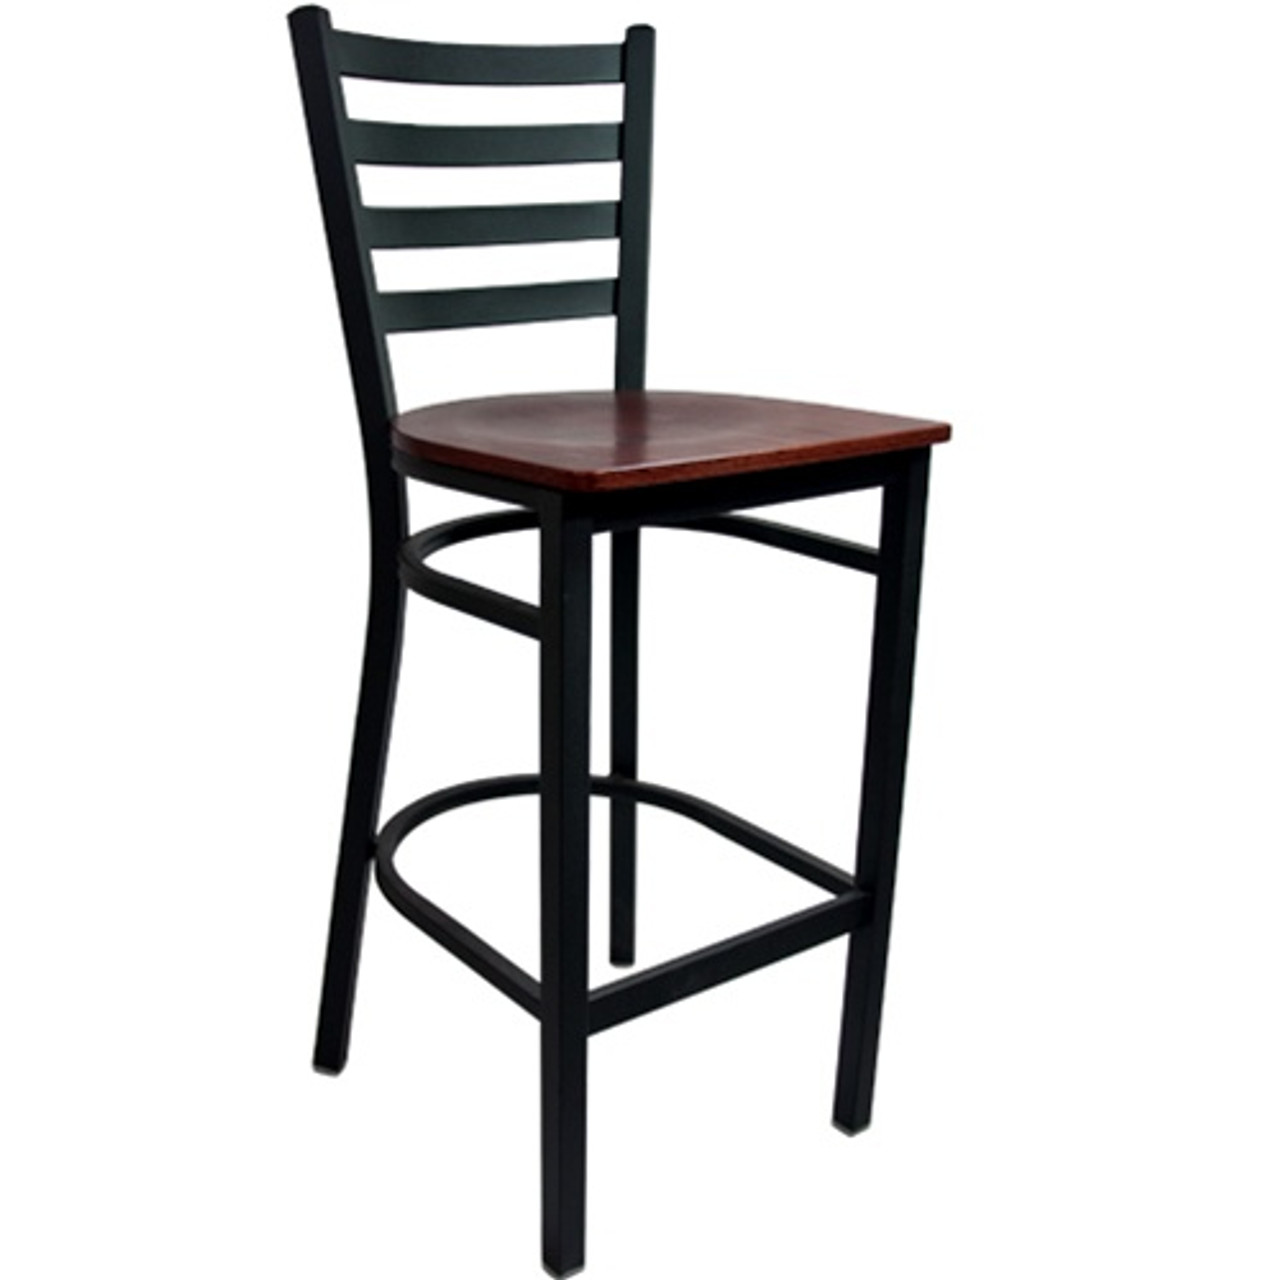 Tremendous Advantage Ladder Back Metal Bar Stool Mahogany Wood Seat Bslb Bfmw Uwap Interior Chair Design Uwaporg